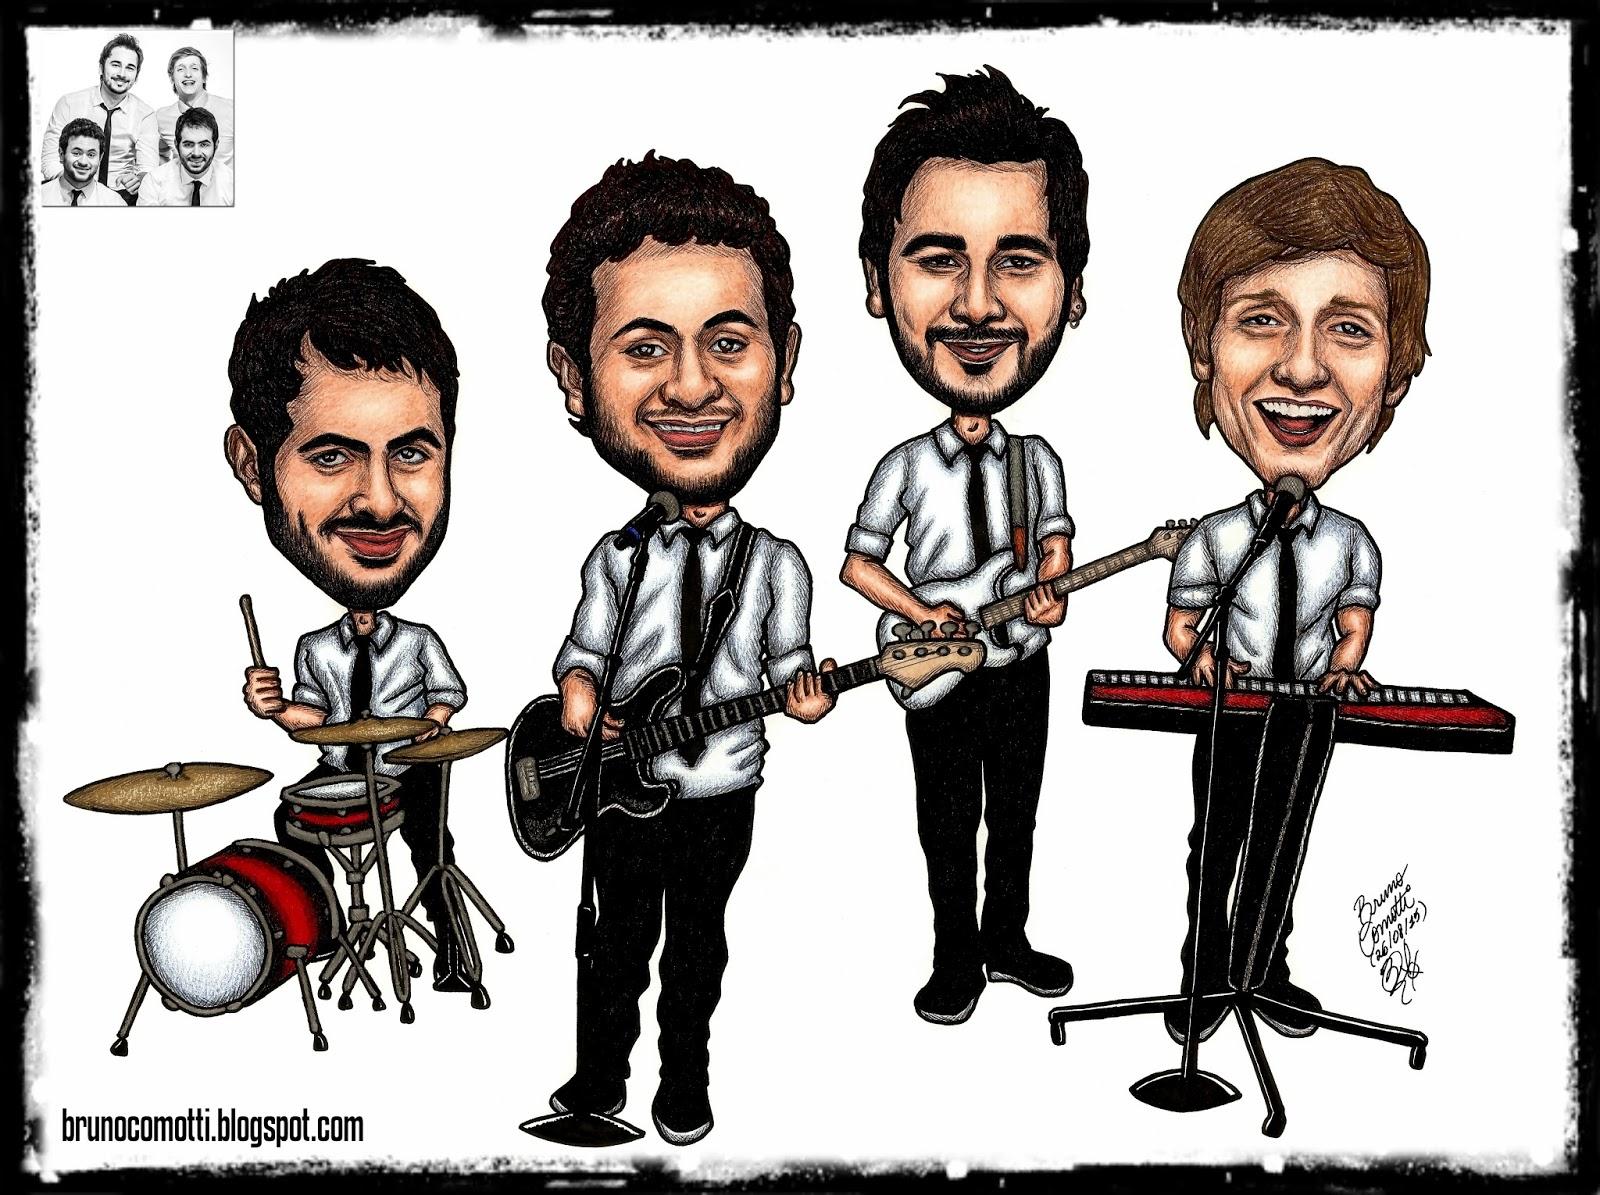 Bruno Comotti Ilustrações: Encomenda: Caricatura Banda Jamz